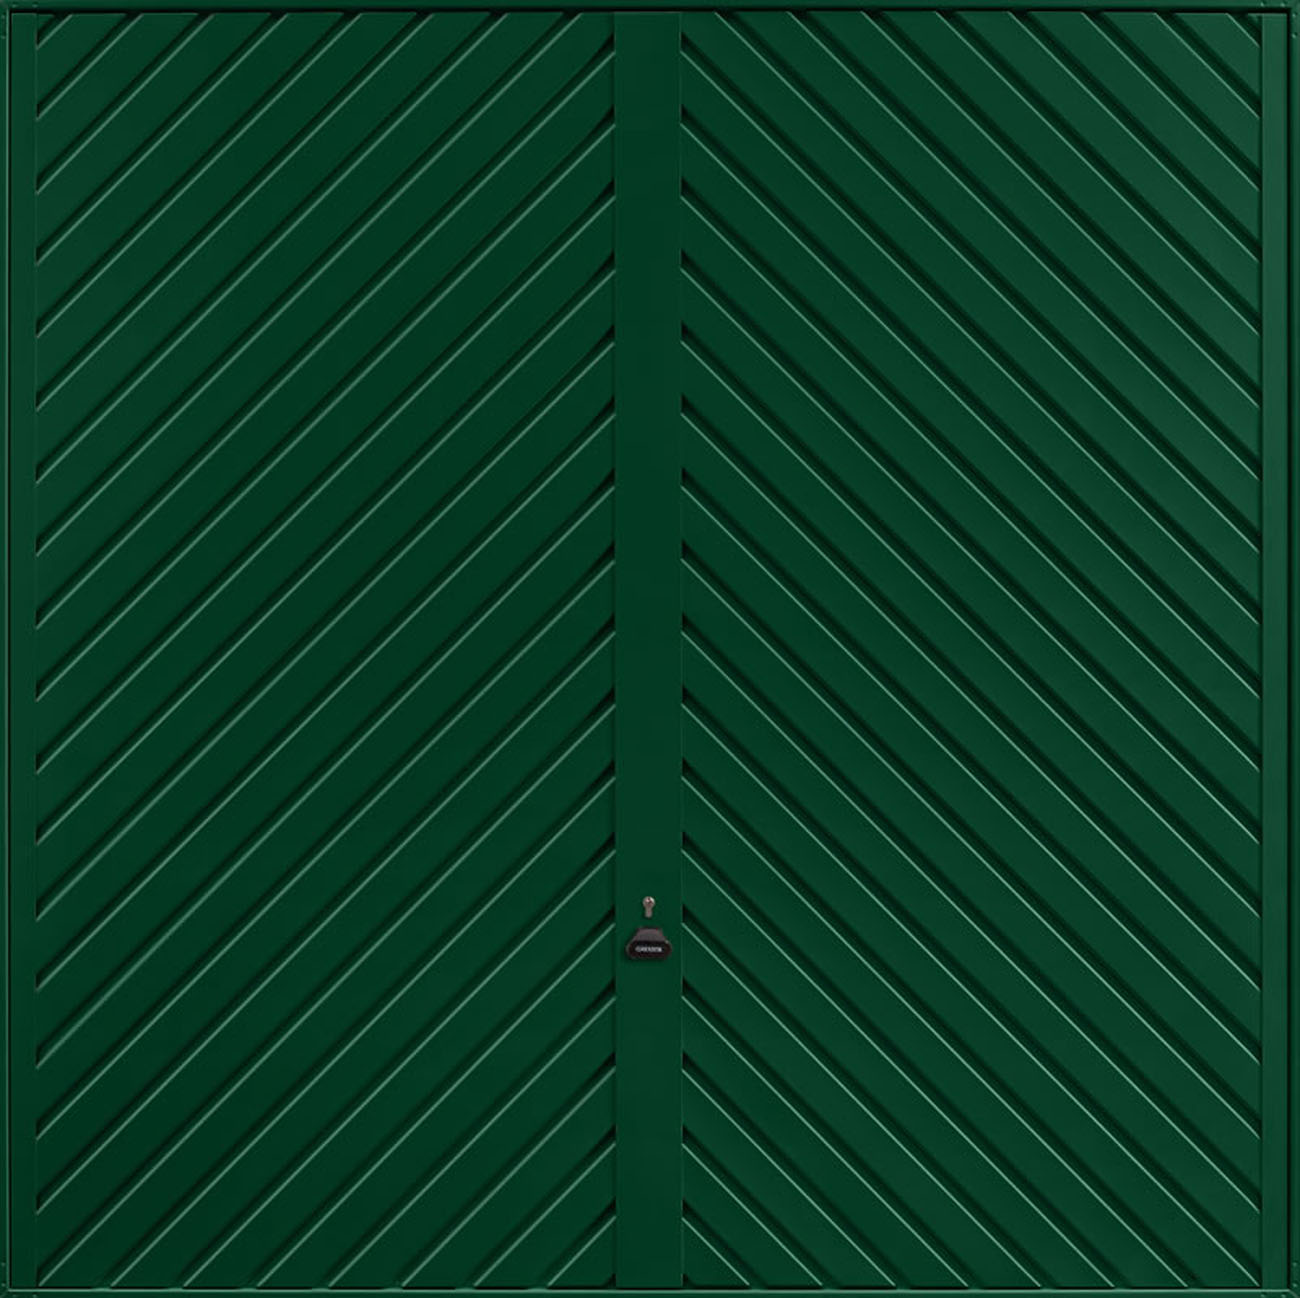 Garador Chevron Emsworth Garage Doors